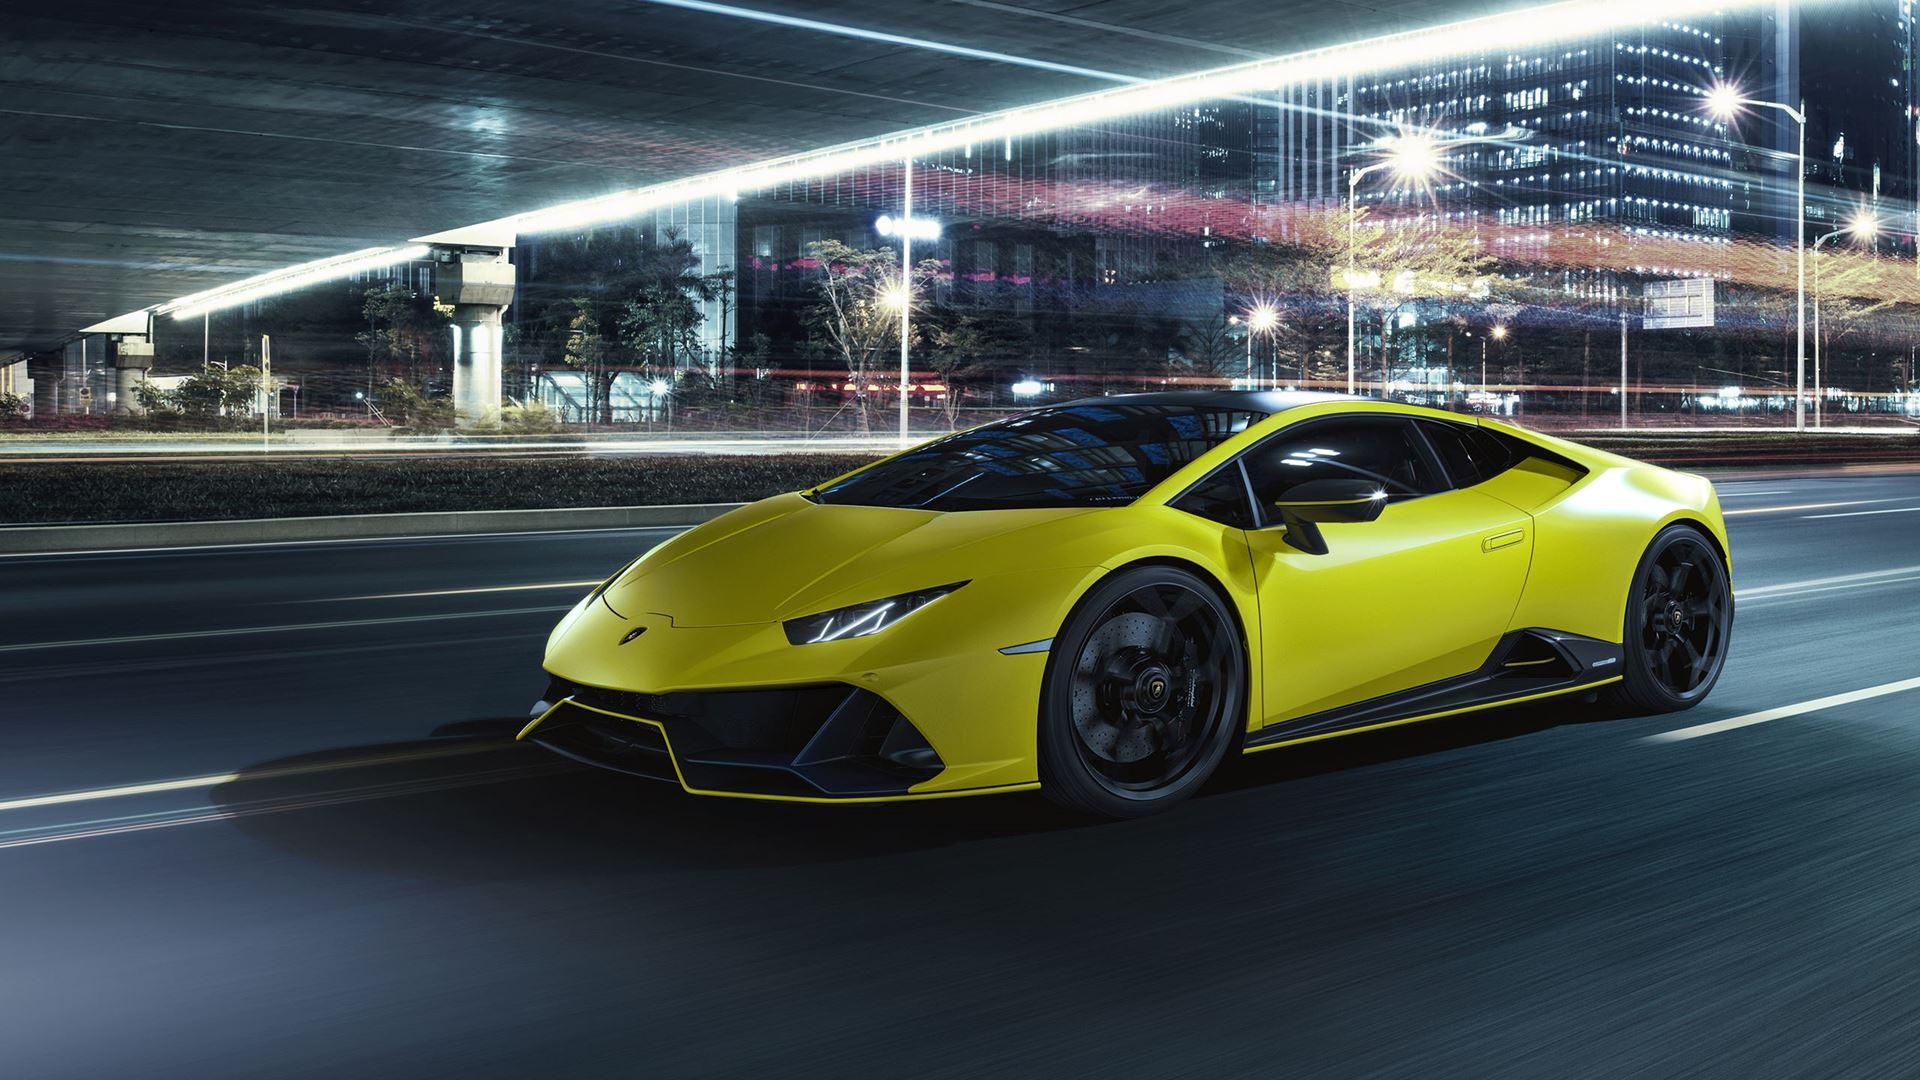 Daring elegance: Automobili Lamborghini presents the Huracán EVO Fluo Capsule - Image 5